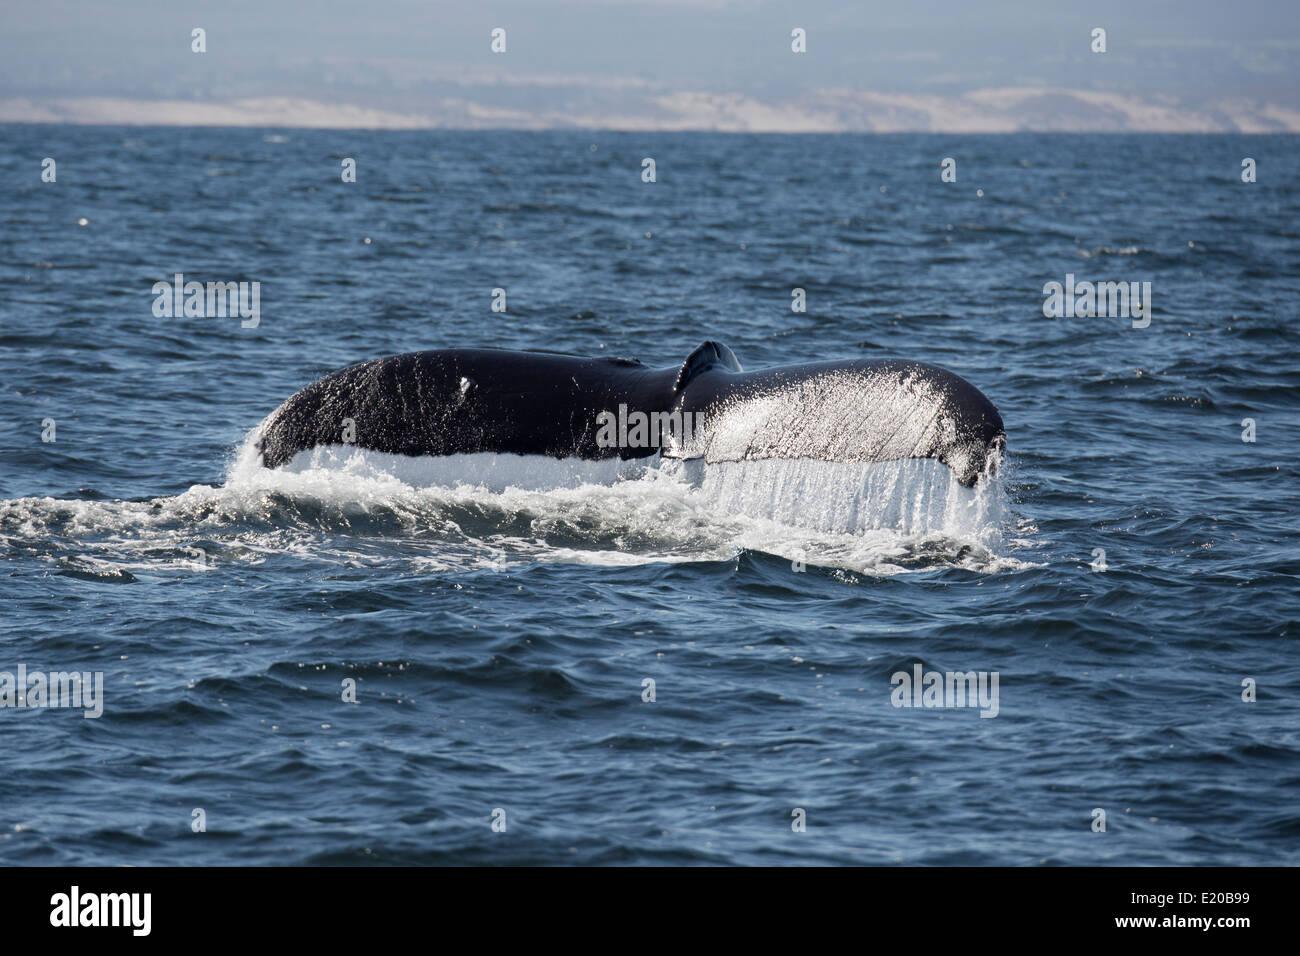 Humpback Whale (Megaptera novaeangliae) fluking. Monterey, California, Pacific Ocean. - Stock Image